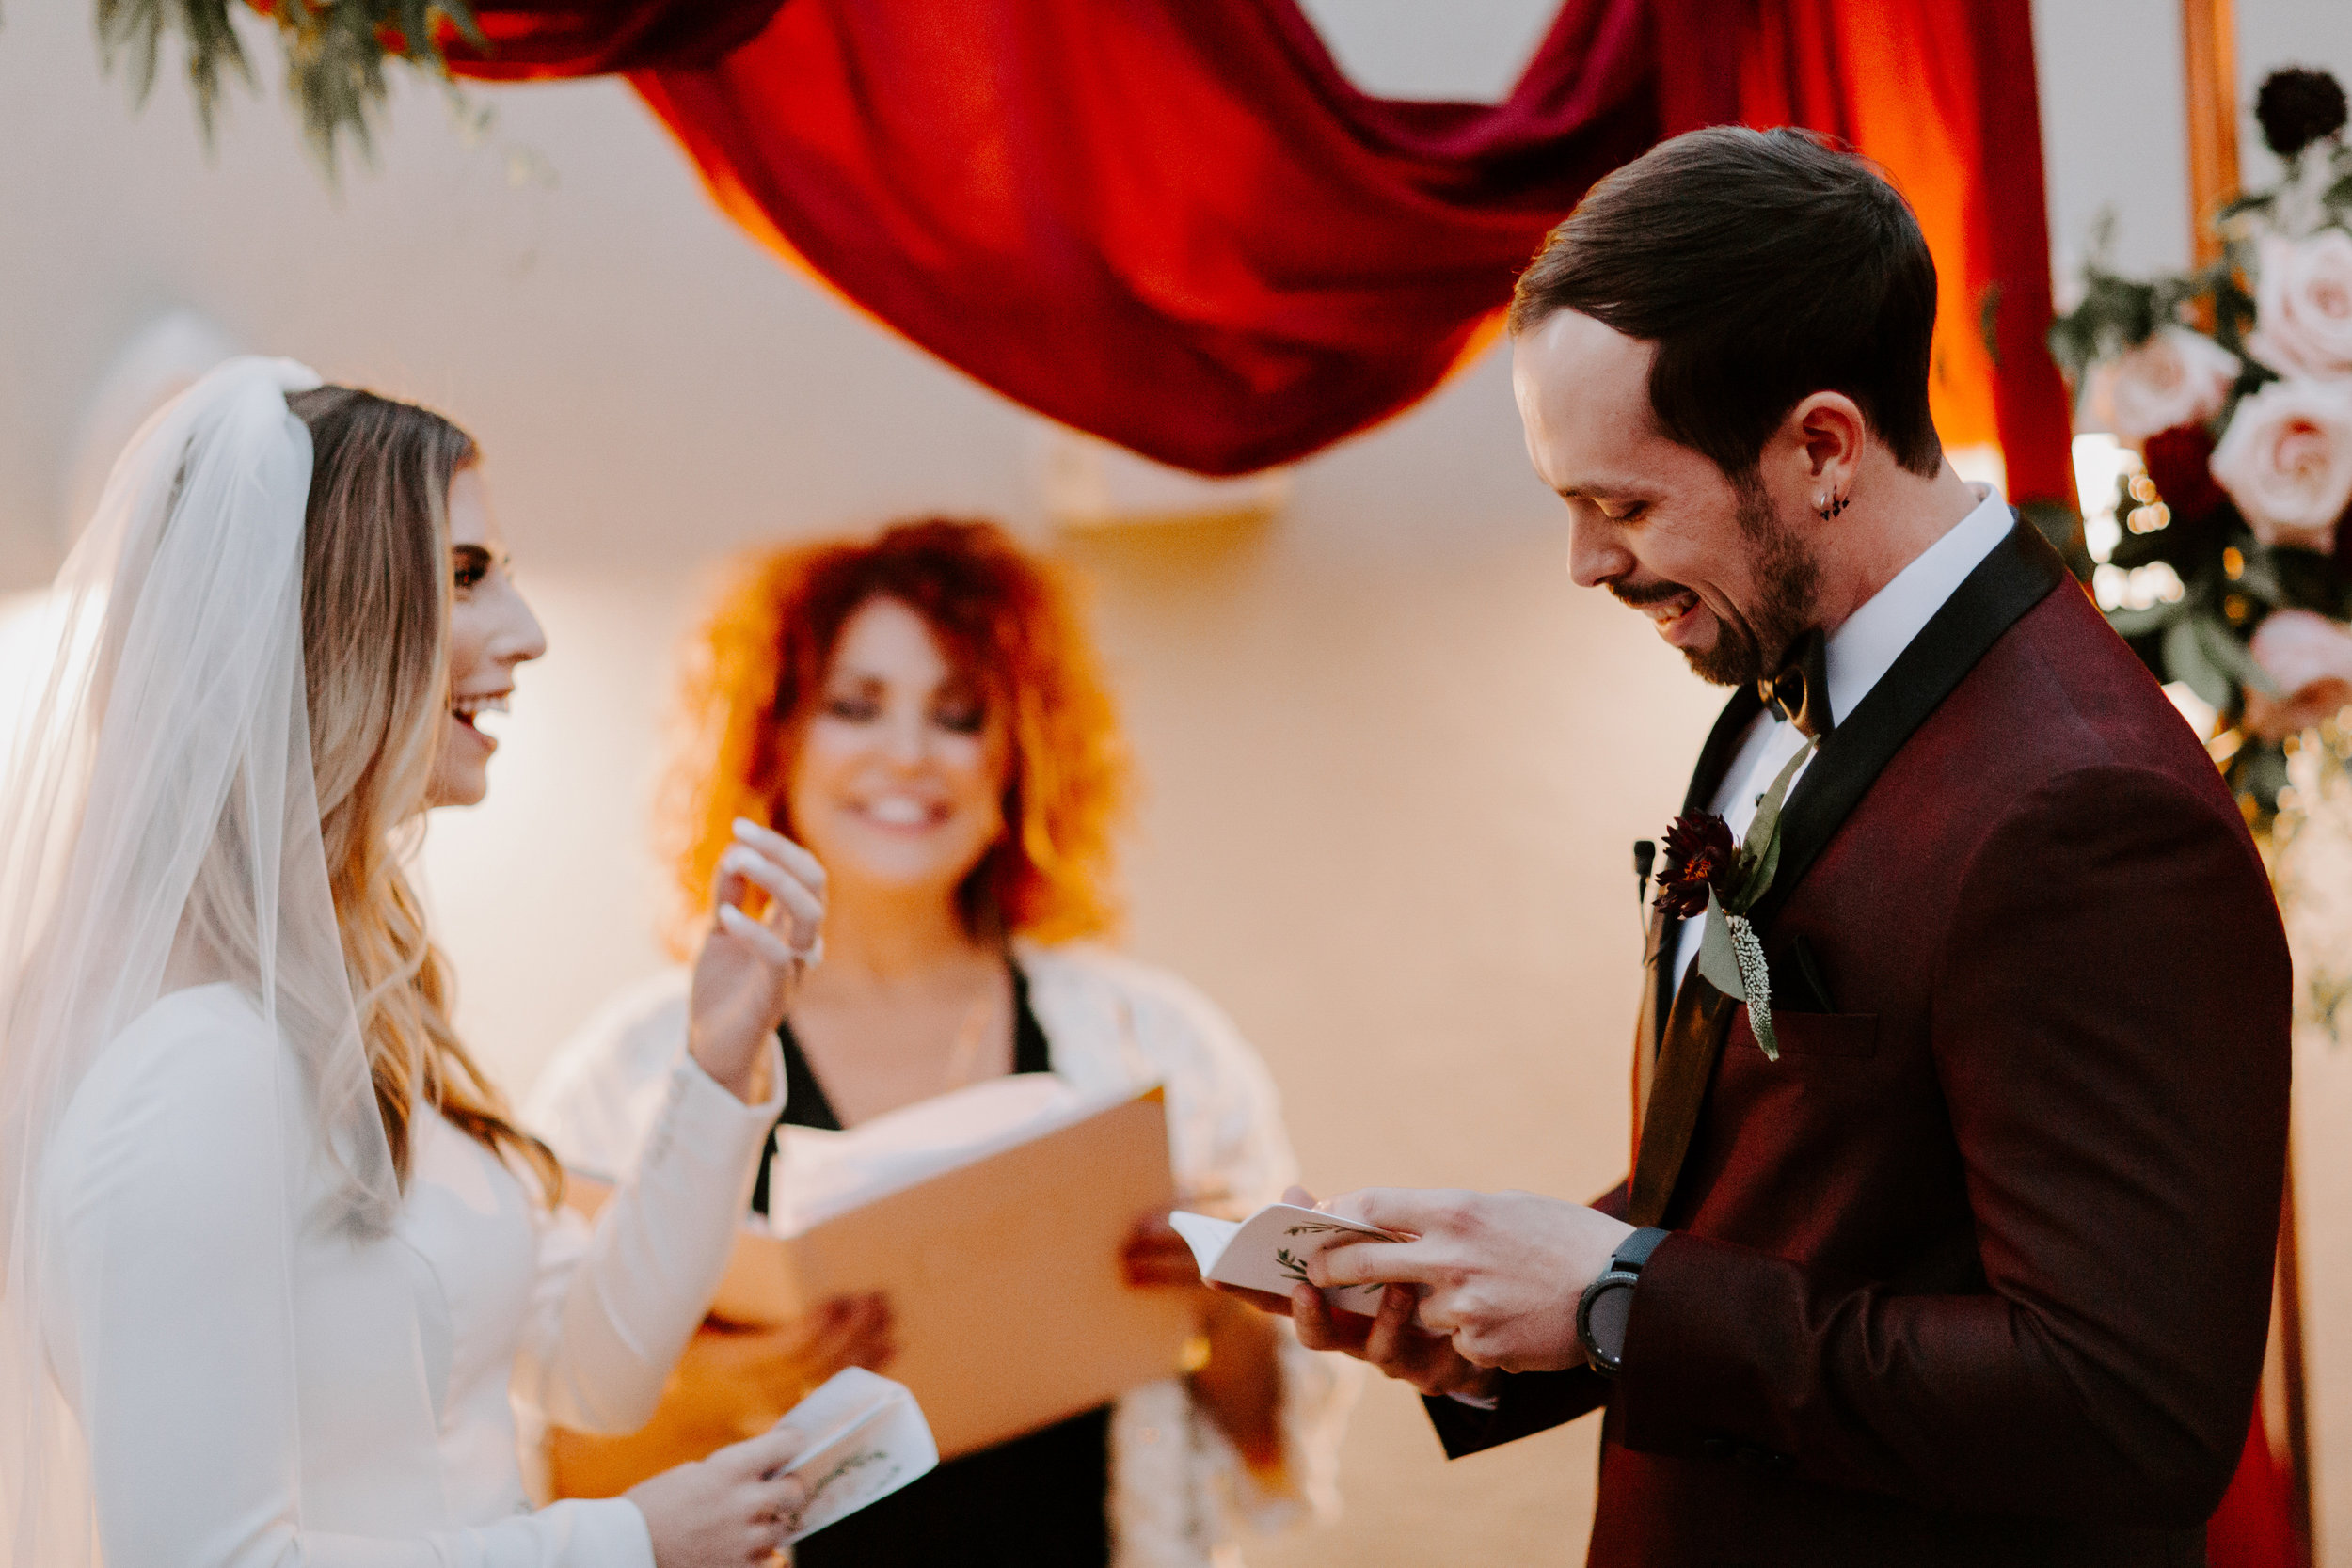 Catahoula Hotel Rooftop Wedding Ceremony New Orleans Wedding Photographer Ashley Biltz Photography42.jpg